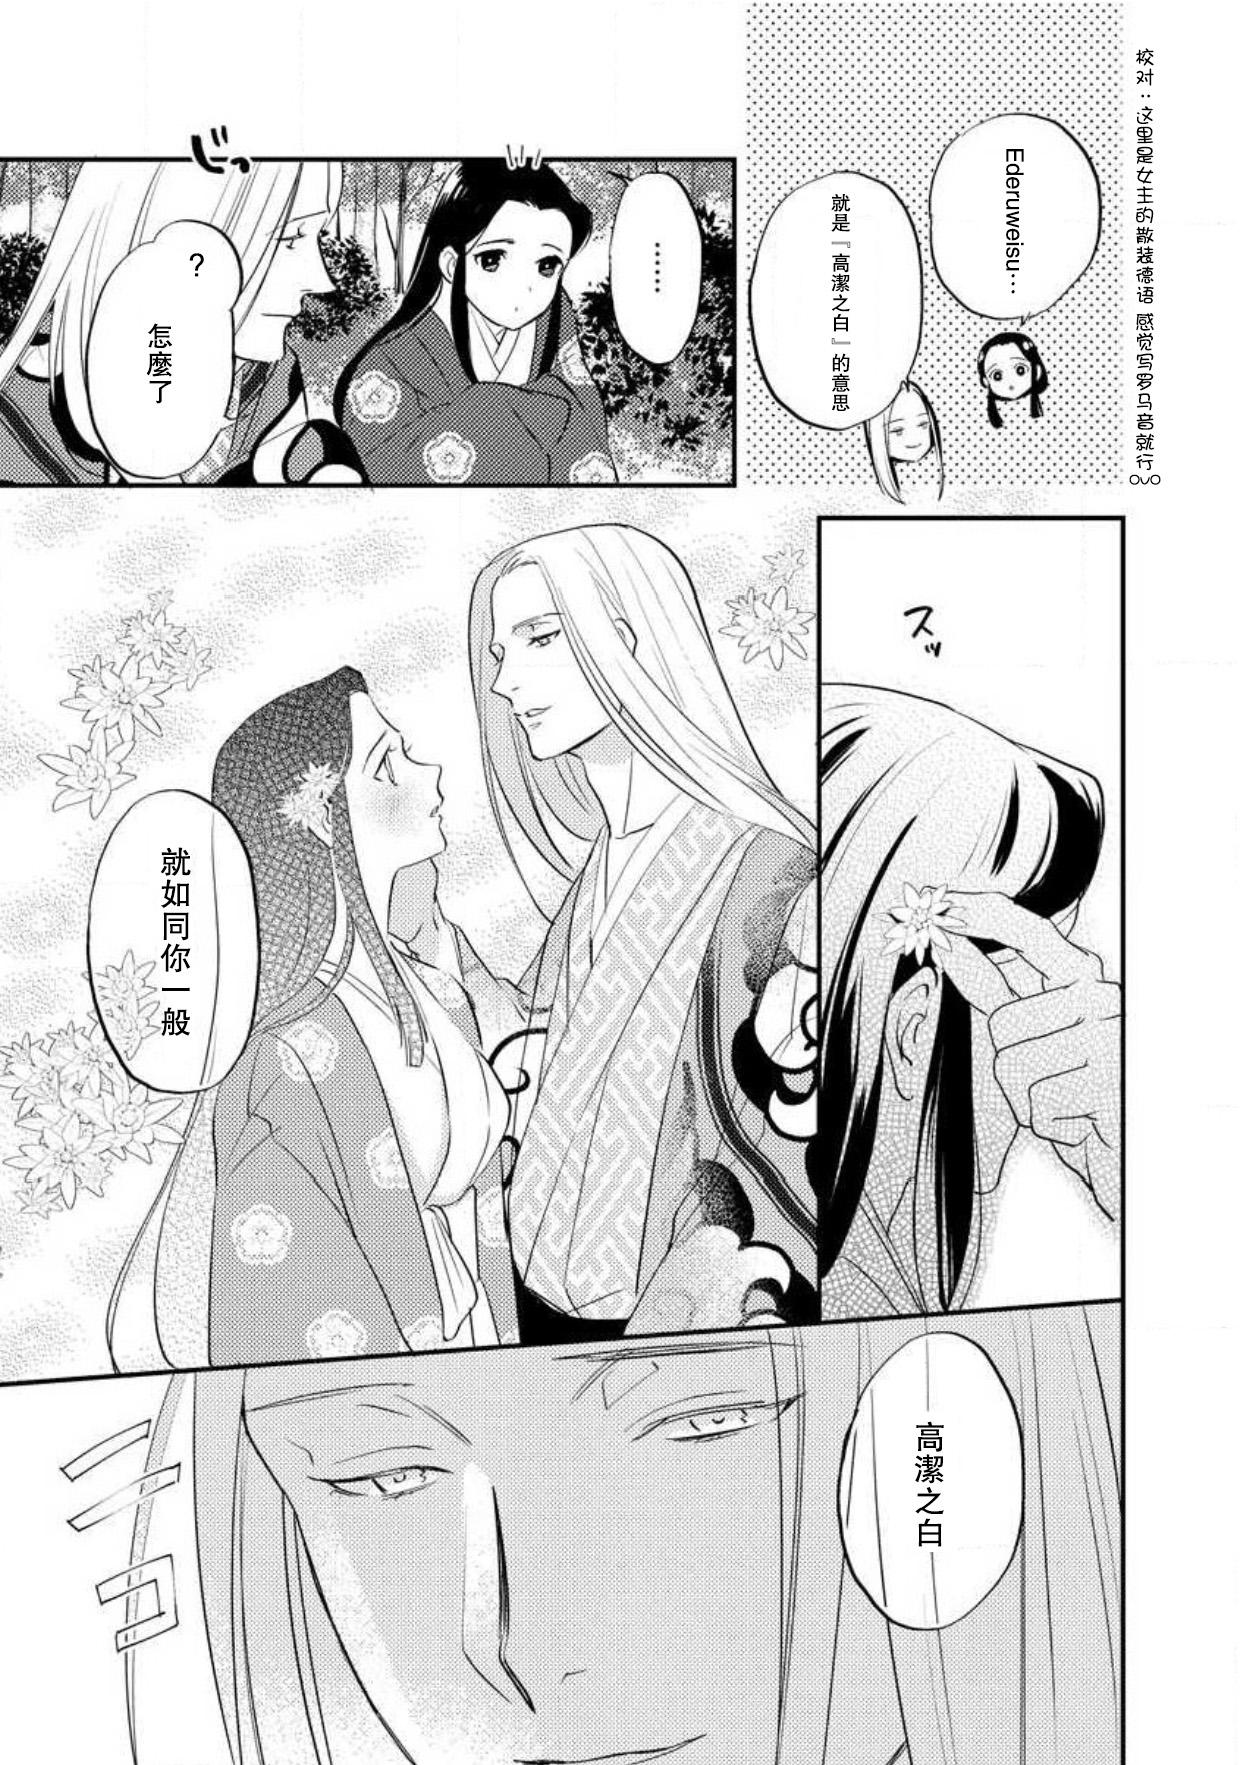 Oeyama suimutan utsukushiki oni no toraware hime | 大江山醉夢逸話 美麗的鬼與被囚禁的公主 Ch. 1-8 188